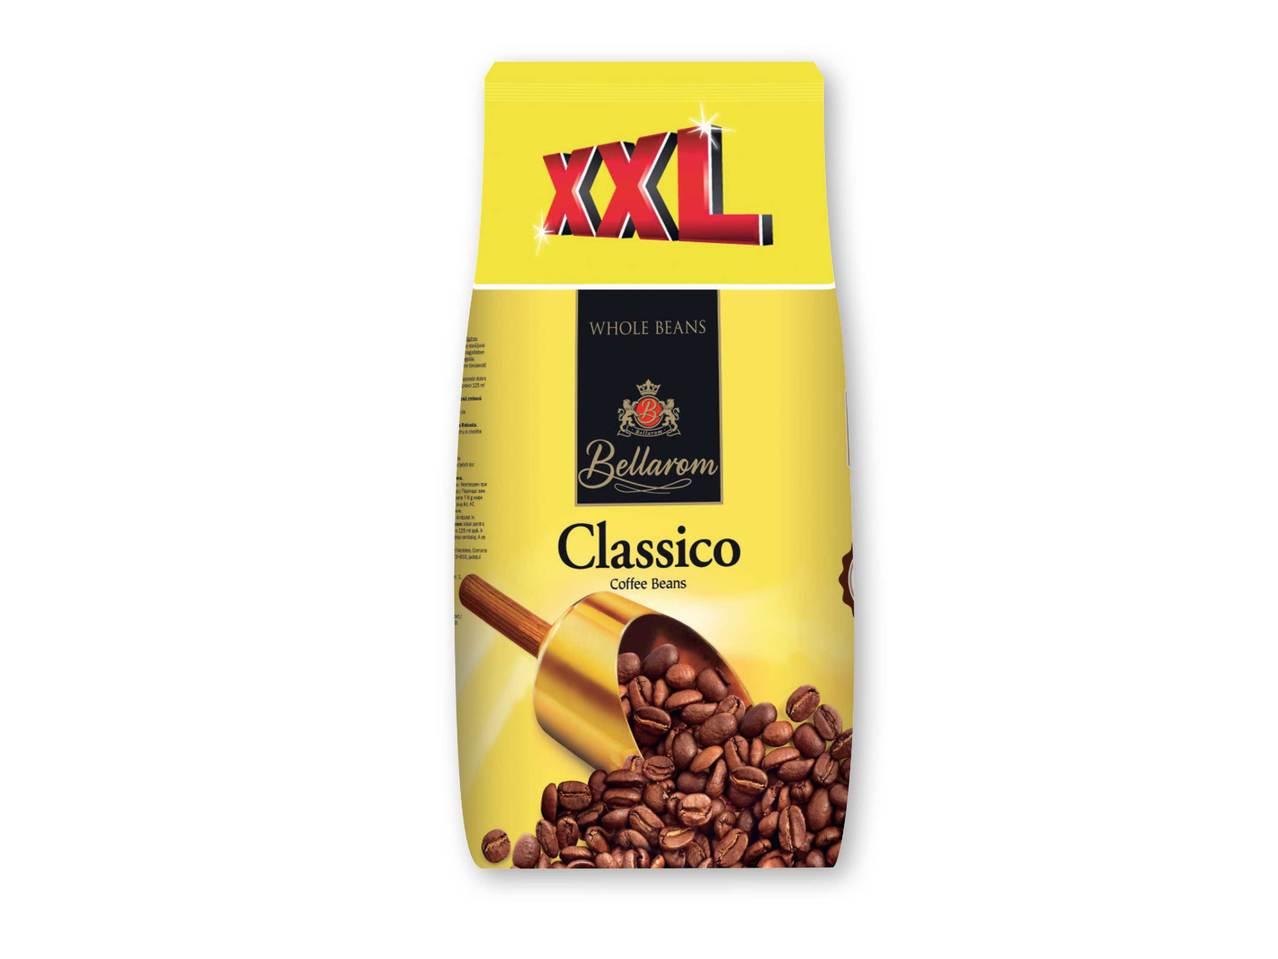 Bellarom Classico Coffee Beans Lidl Ireland Specials